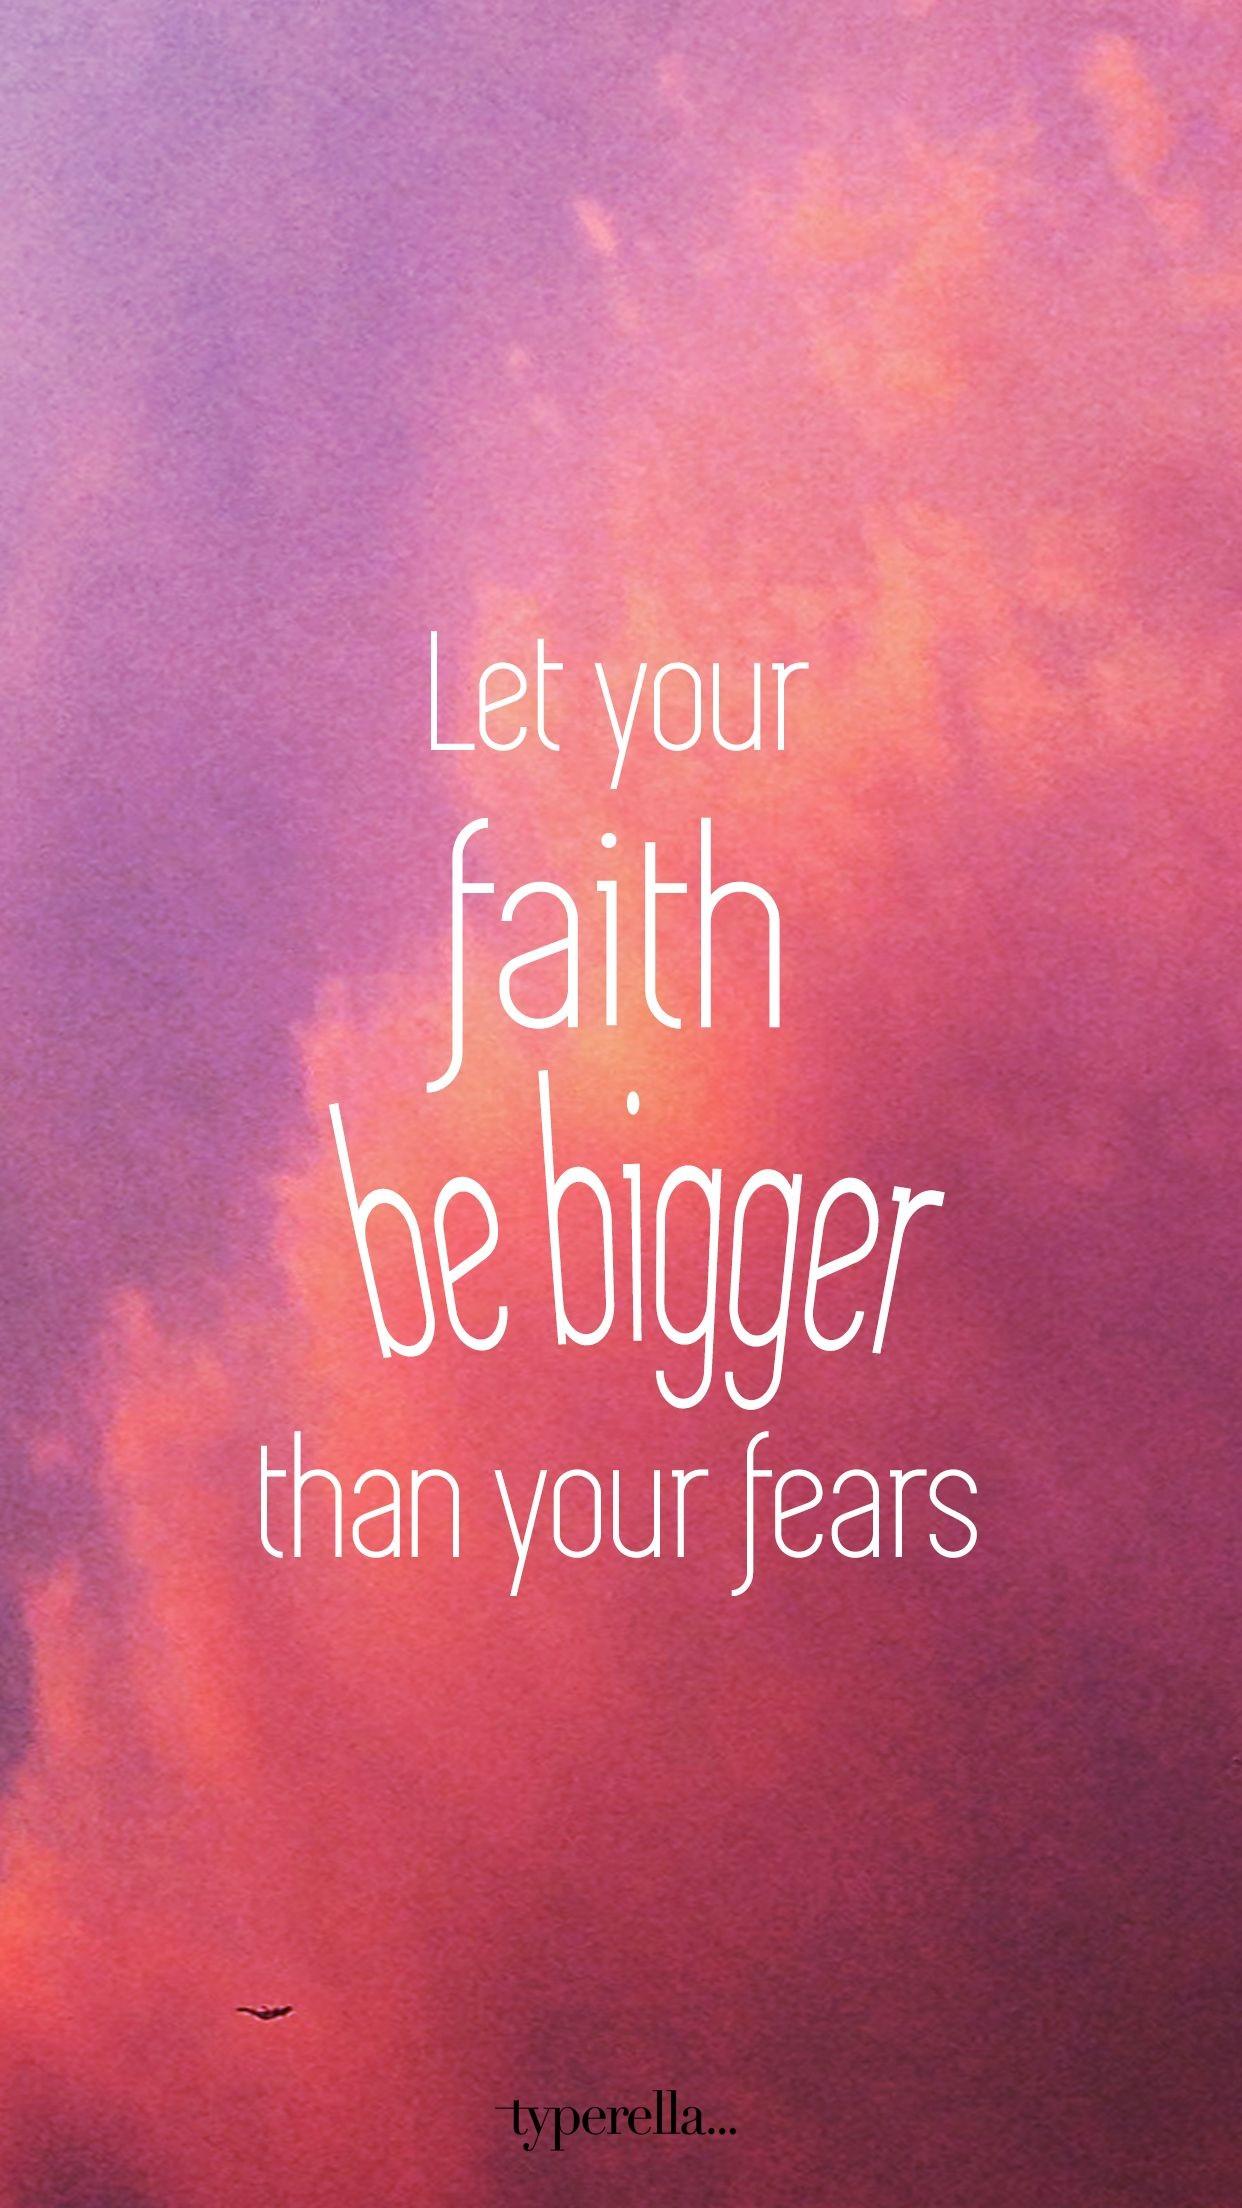 religious quotes images